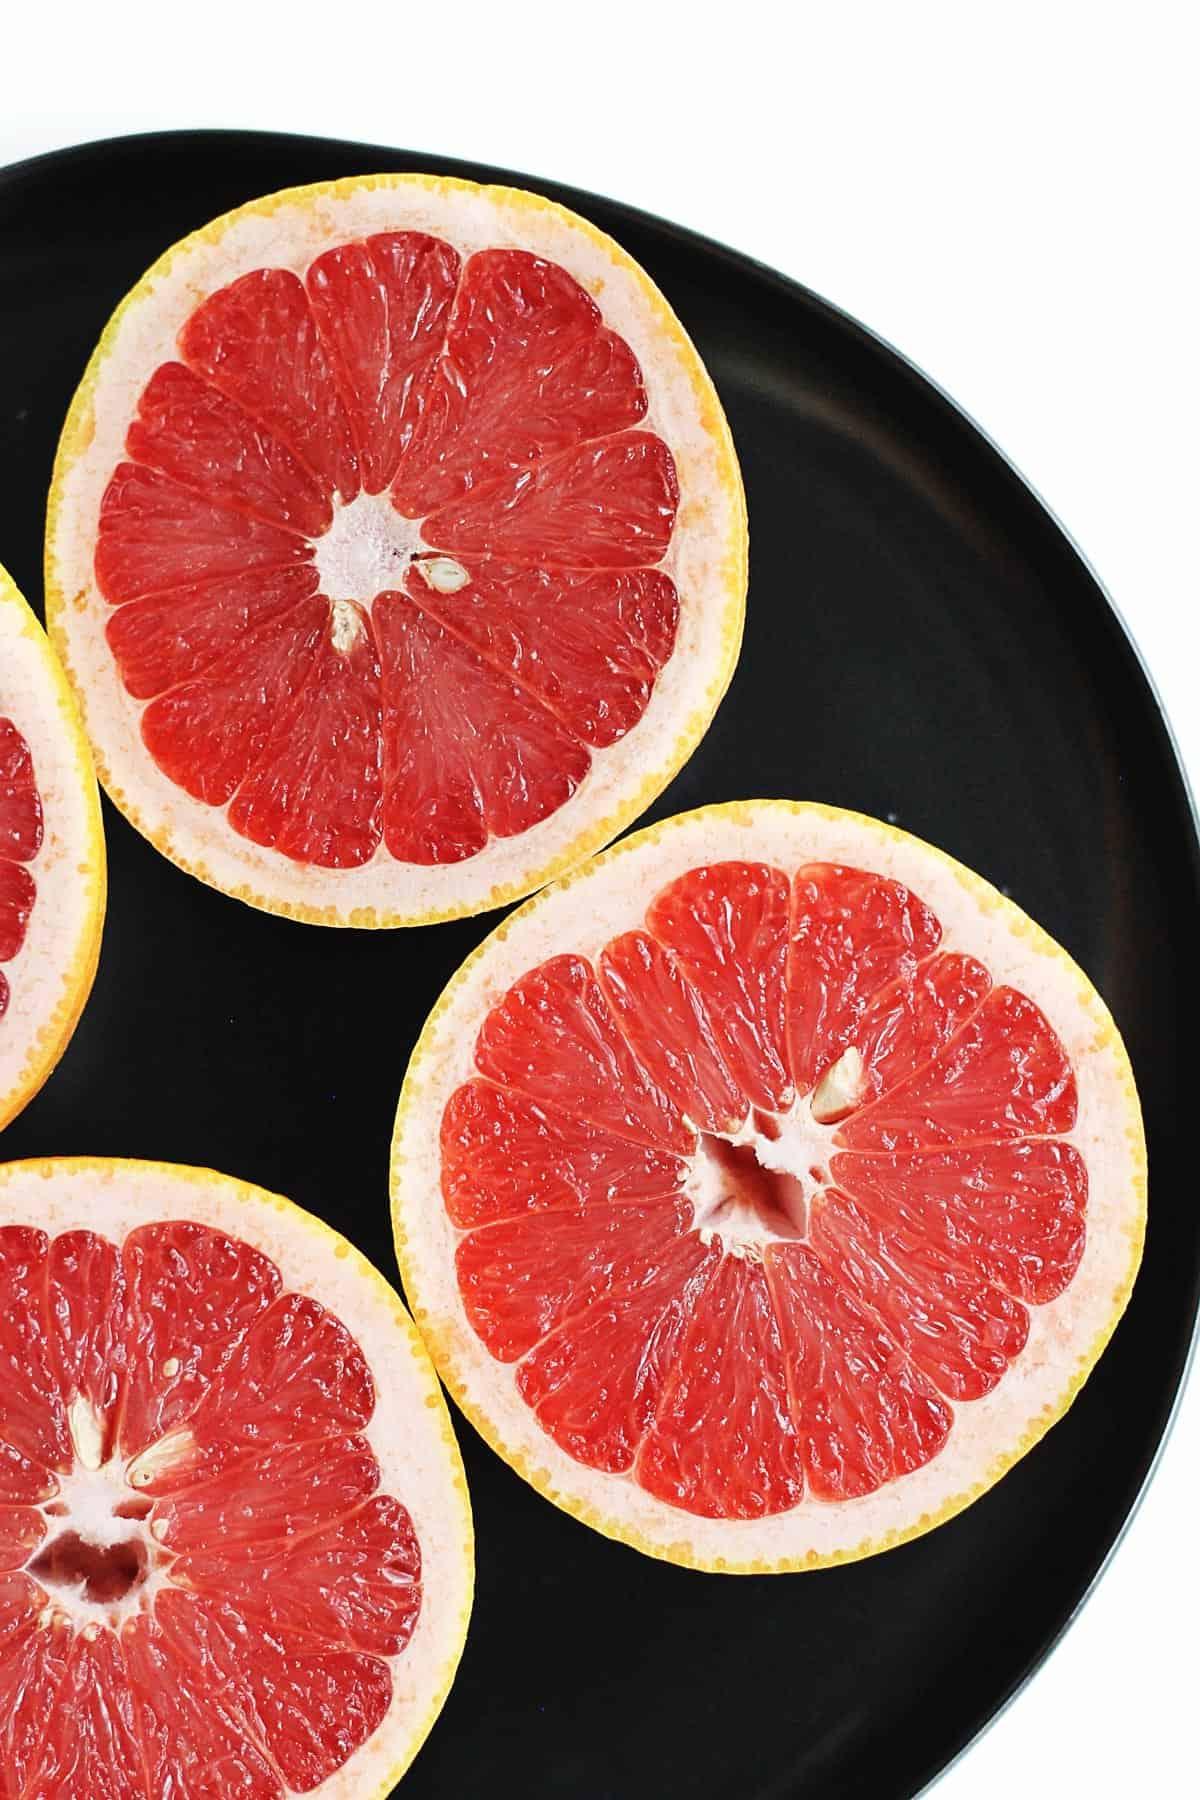 ruby grapefruit halves